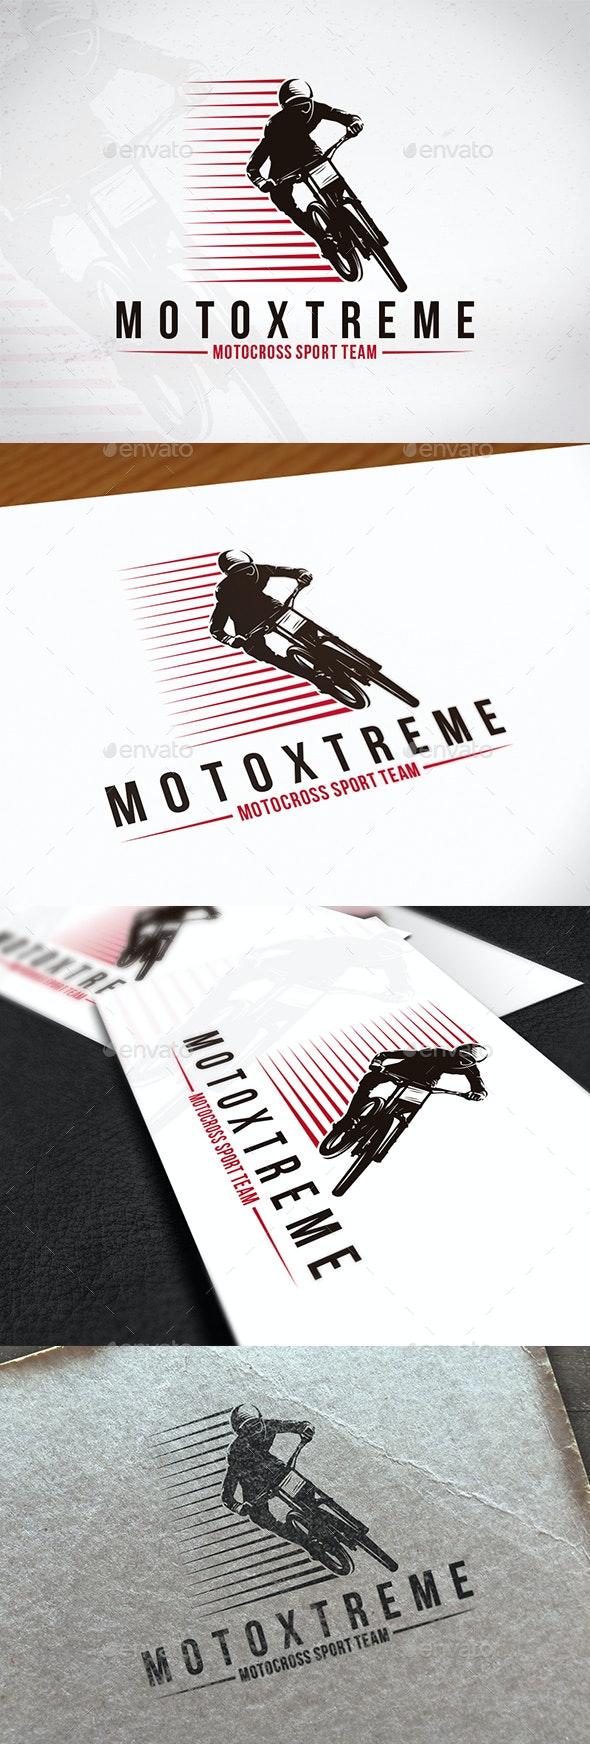 Moto Xtreme Logo Template - Sports Logo Templates